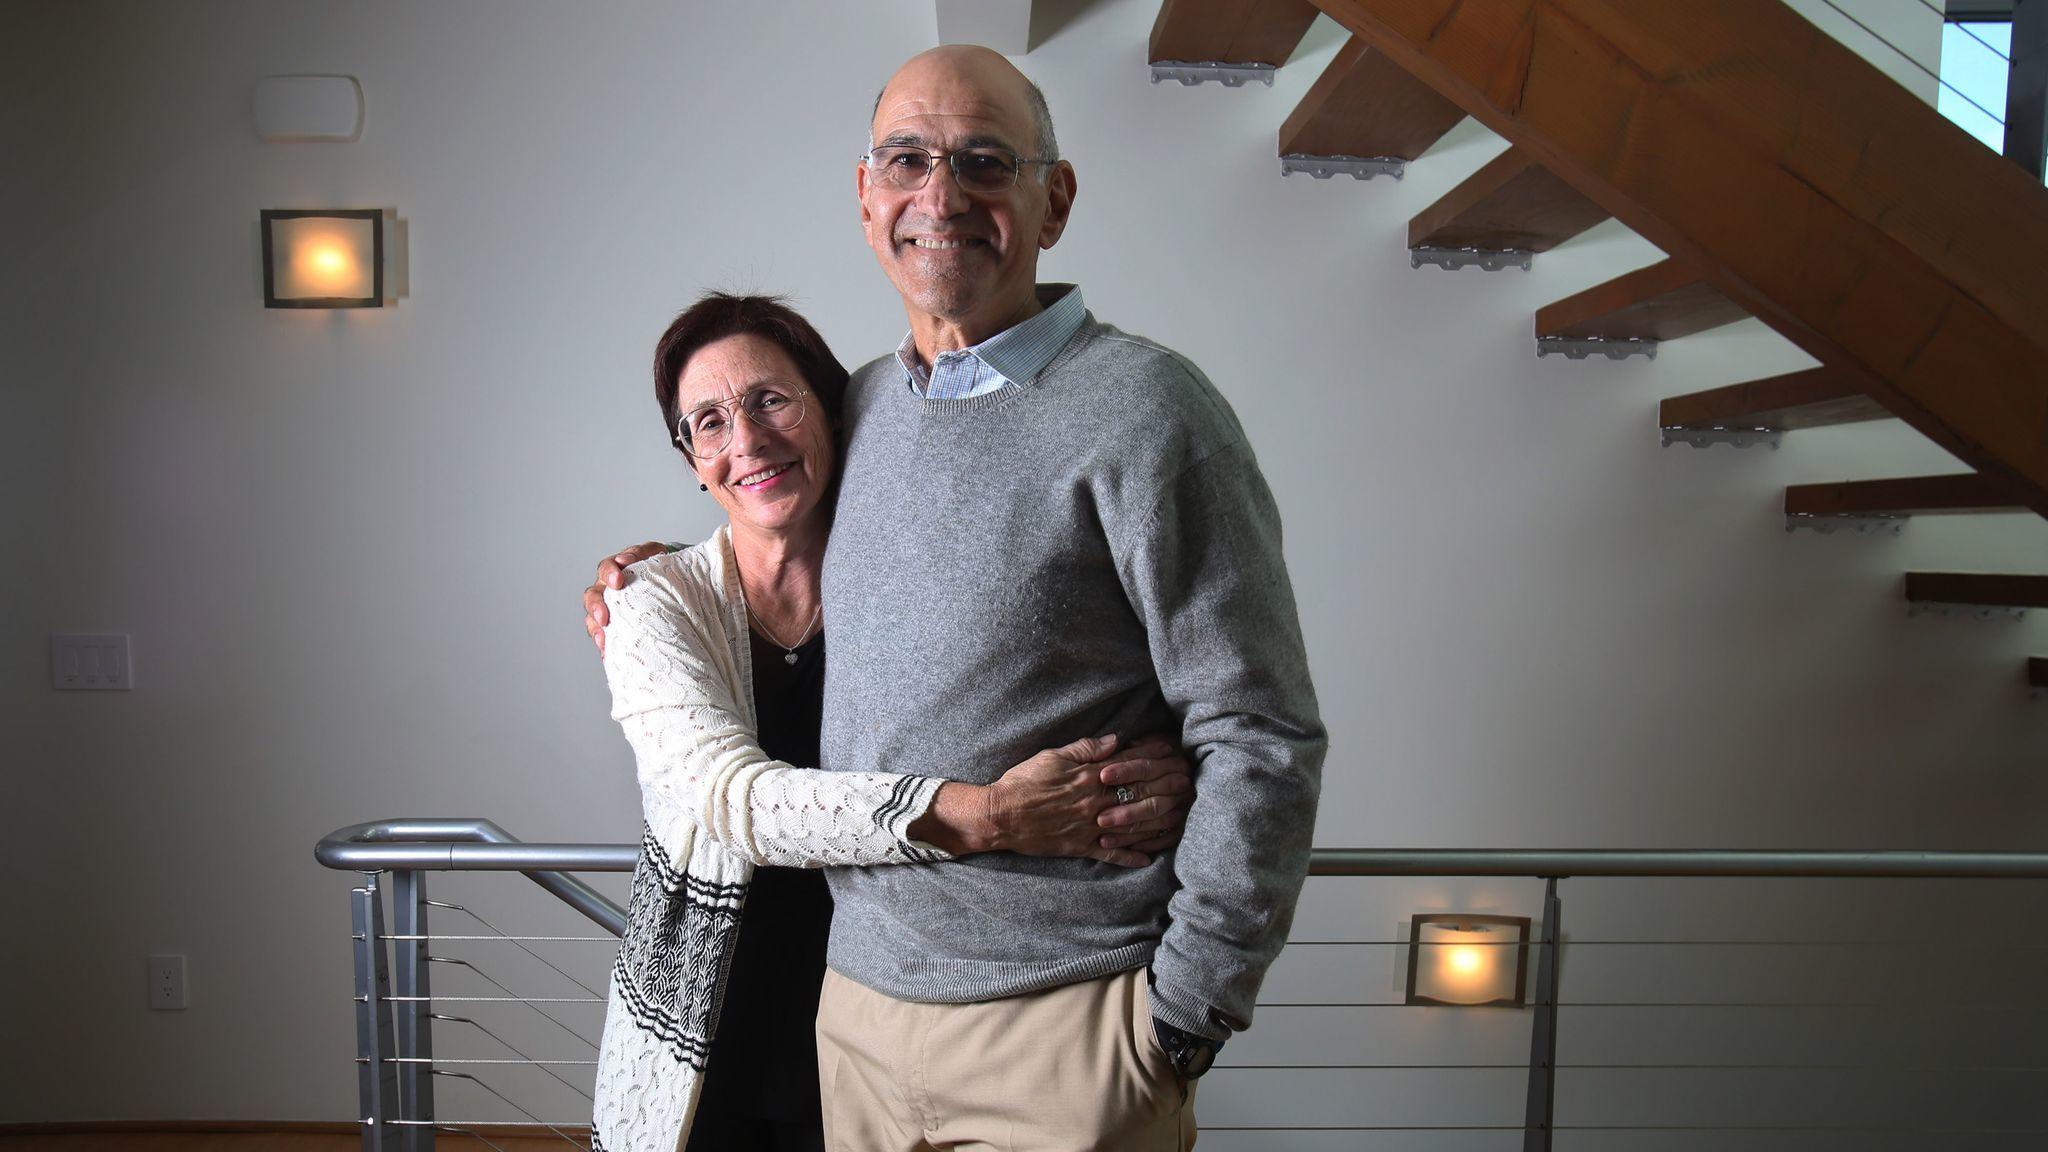 Carlsbad couple shedding light on rare cancers